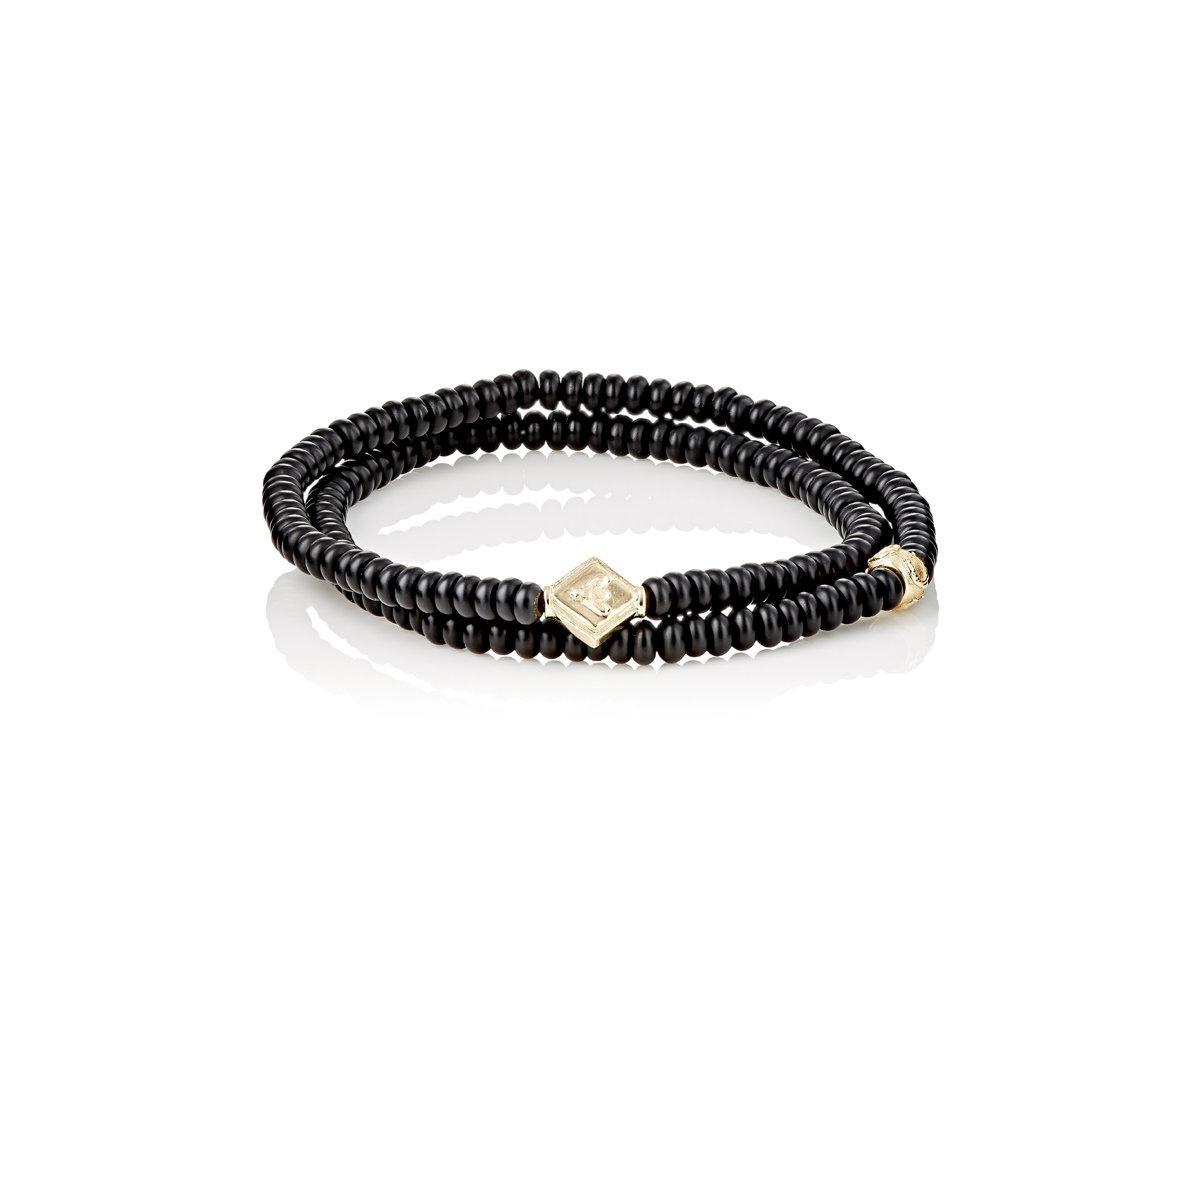 Luis Morais Wood And Gold Bead Bracelet - Dark brown pV02oLxi